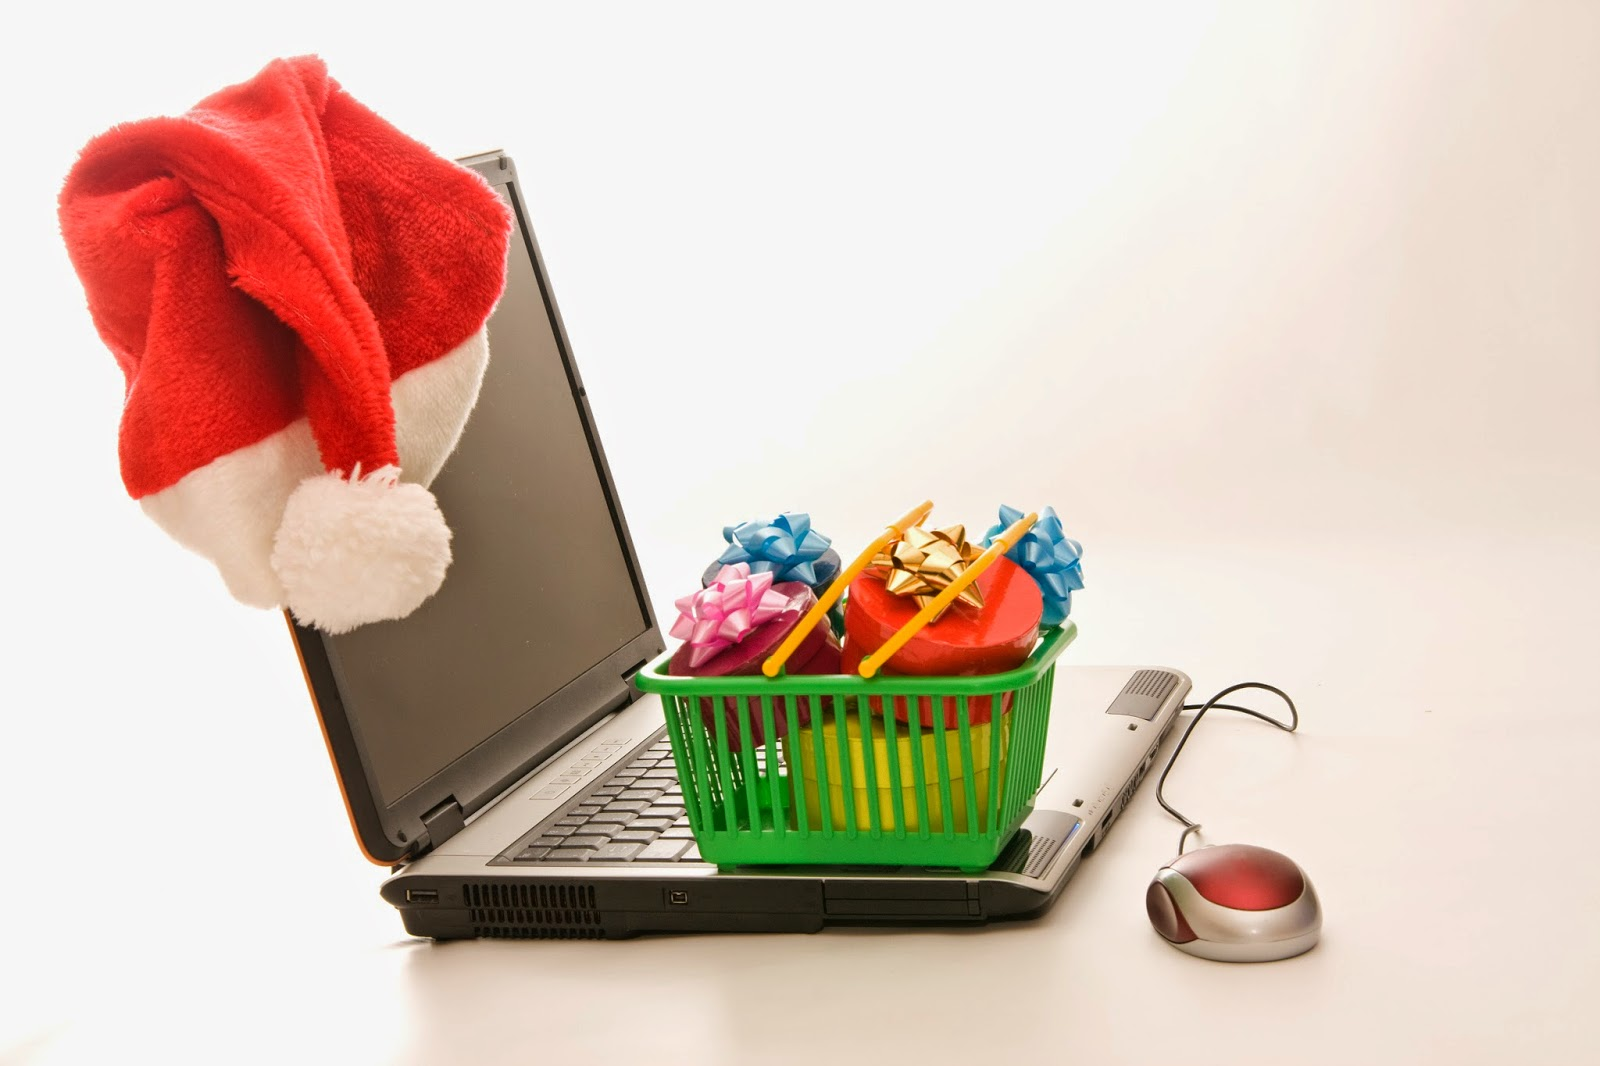 Christmas, shopping for christmas, shopping, e marketing, ecommerce, Christmas gifts, gifts, e-commerce, Christmas shopping, Christmas shopping online, Santa Claus,